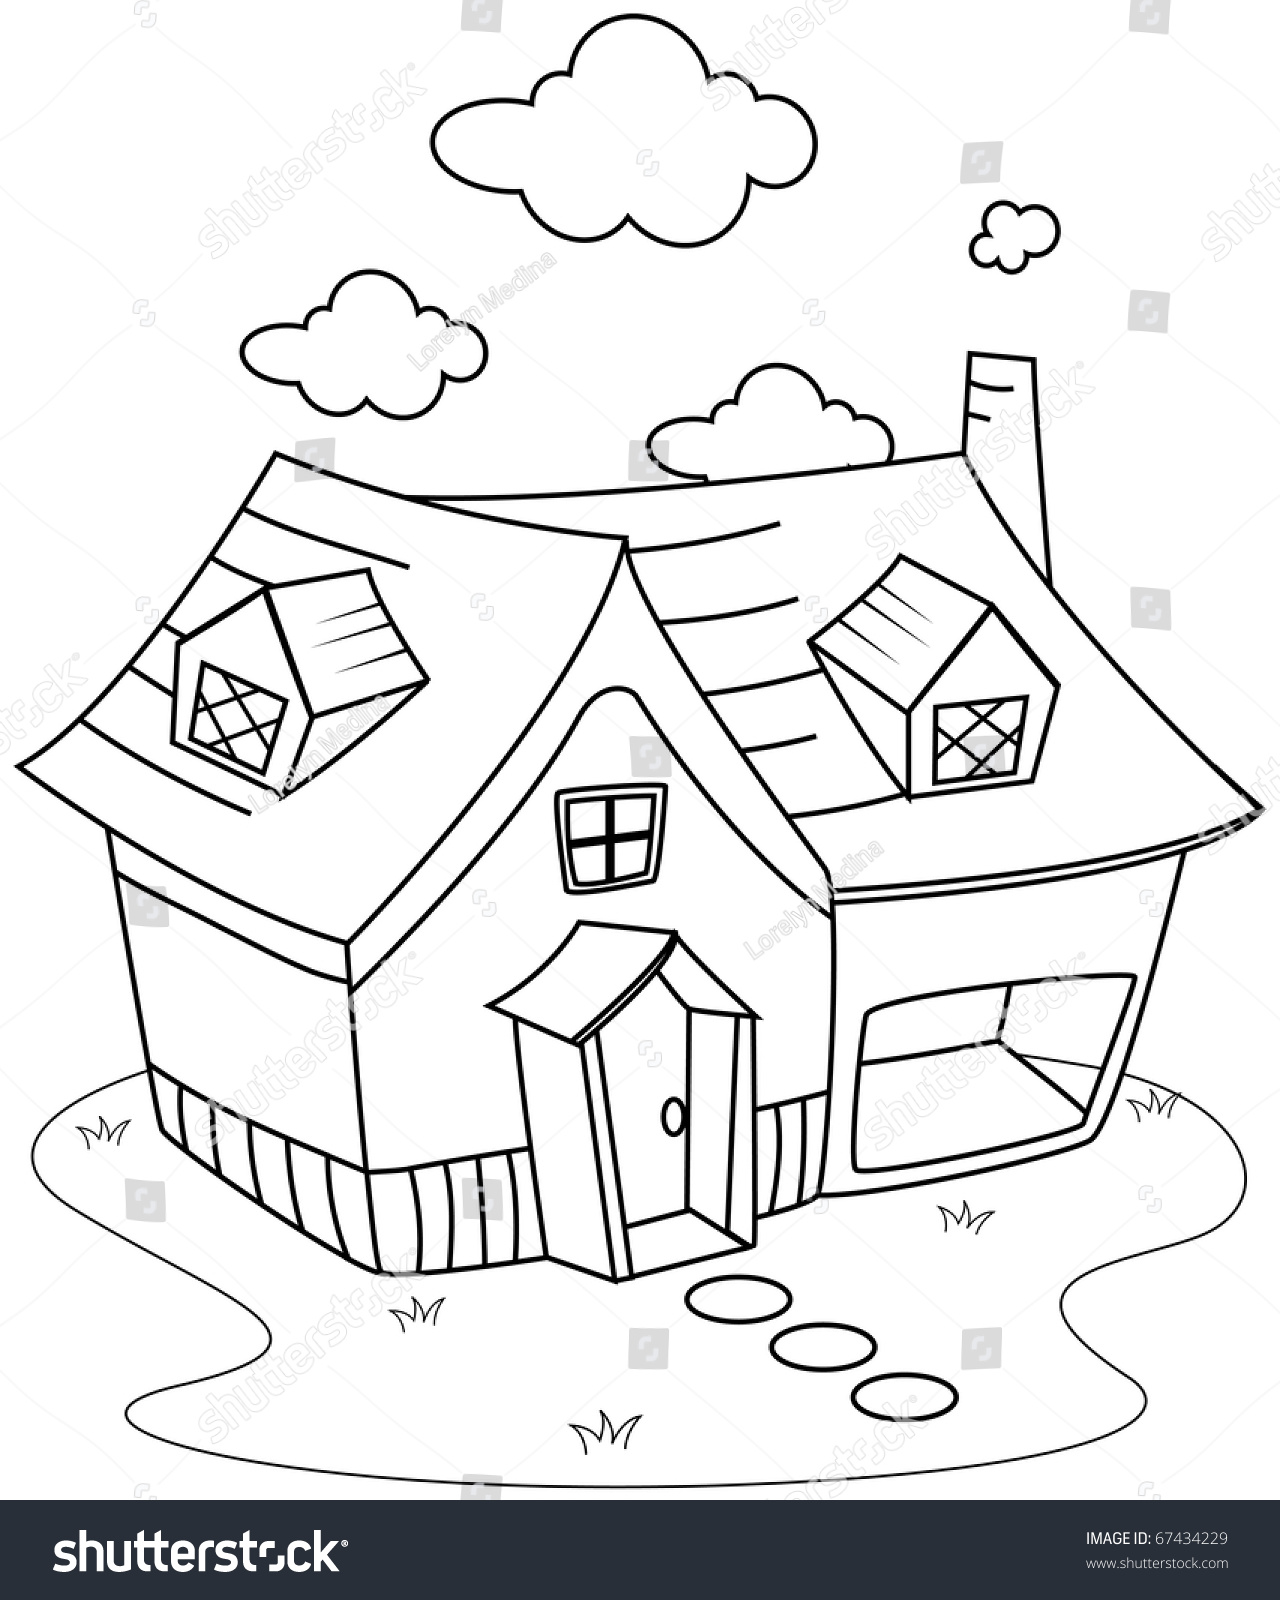 Line art illustration of a cute little house coloring for Little house coloring pages